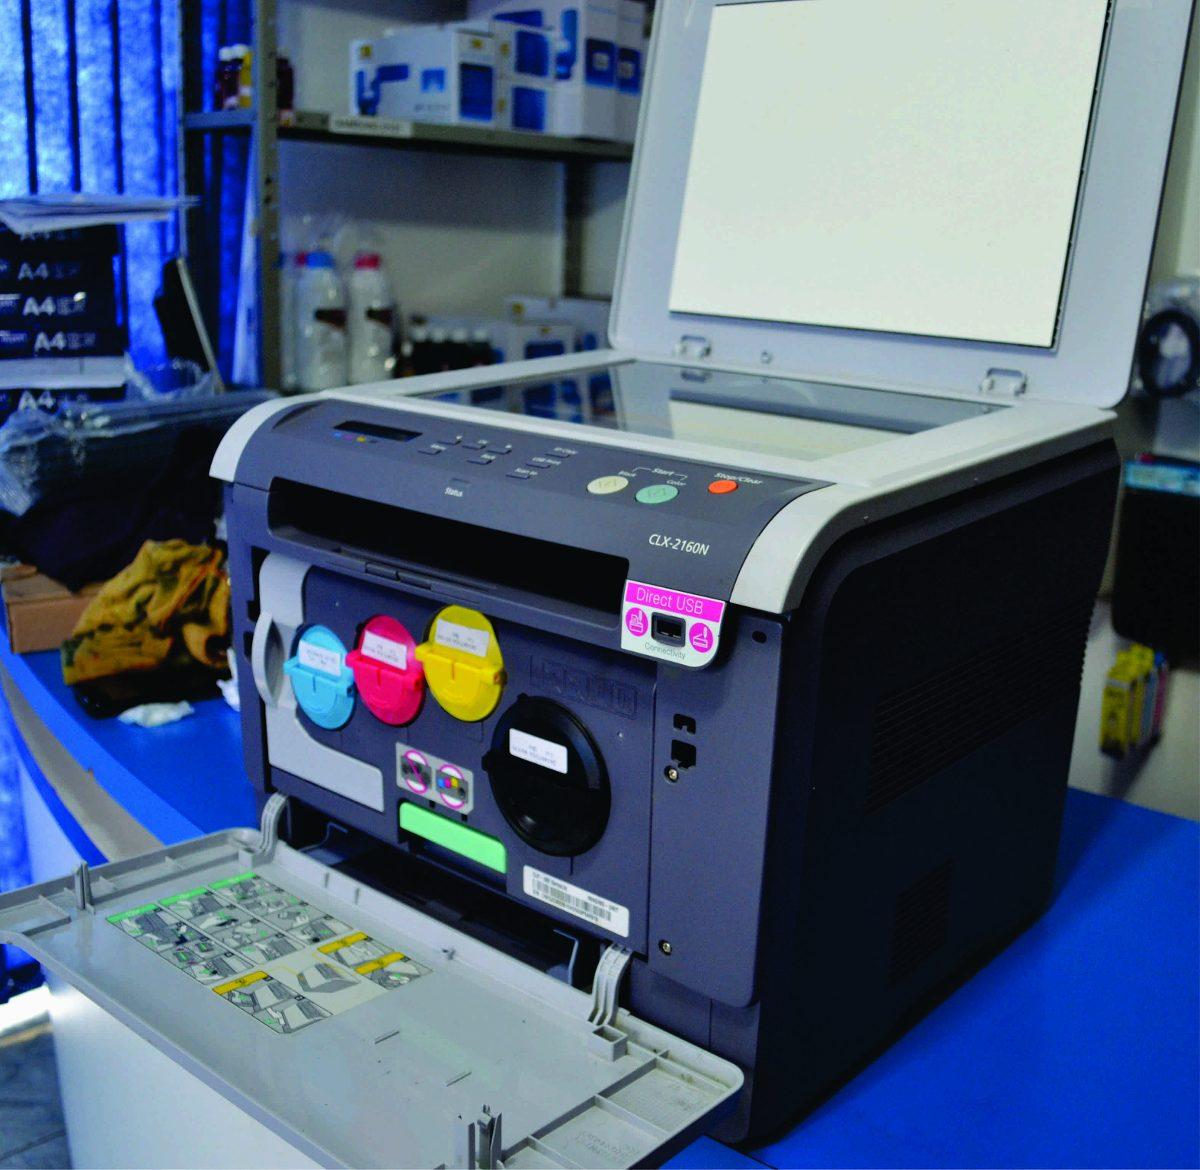 impressora samsung clx 2160n laser color defeito r 359 90 em mercado livre. Black Bedroom Furniture Sets. Home Design Ideas